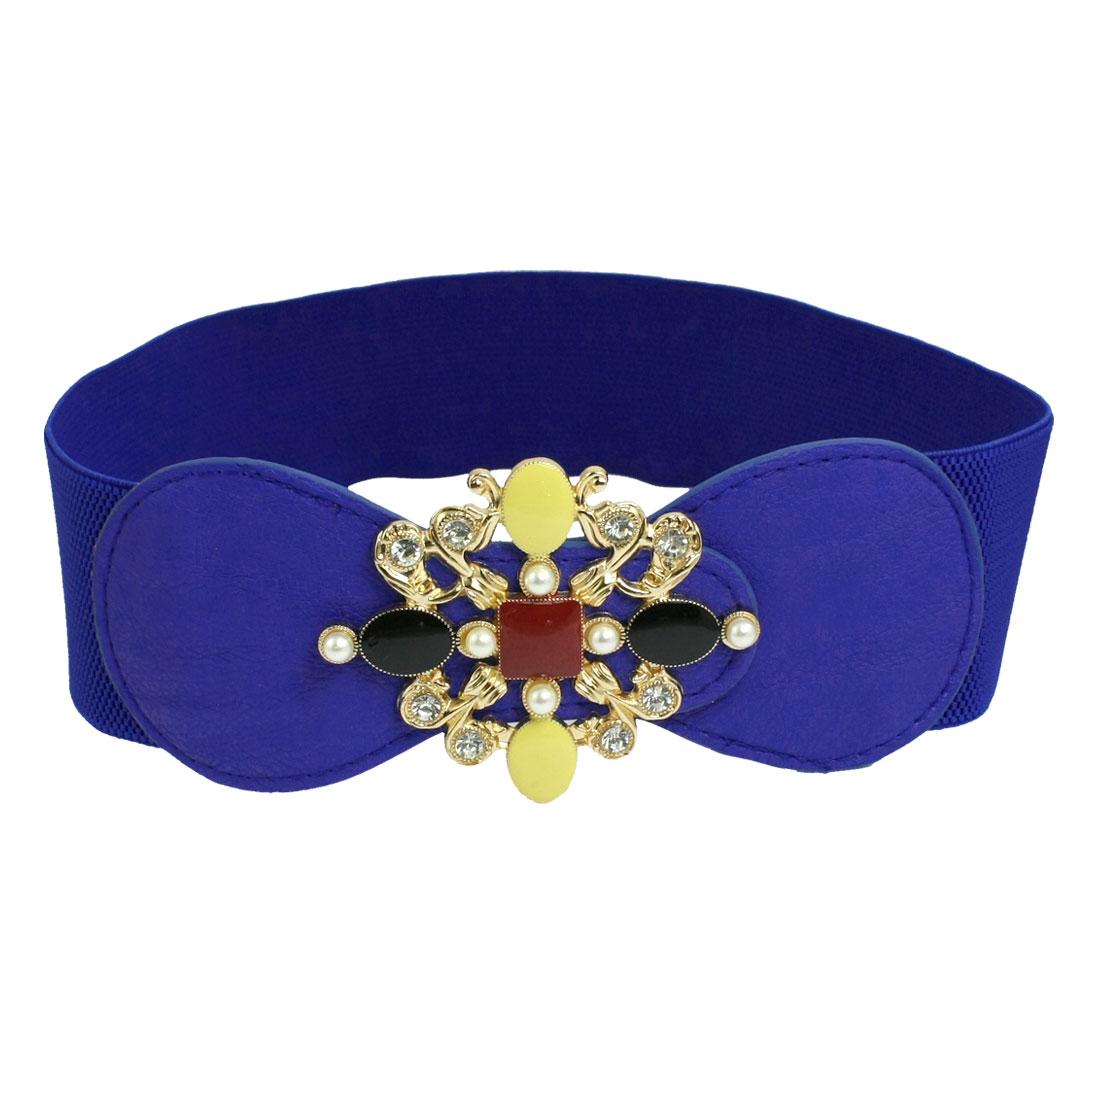 Blue Rhinestone Detail Faux Leather Decor Stretchy Waist Belt for Ladies